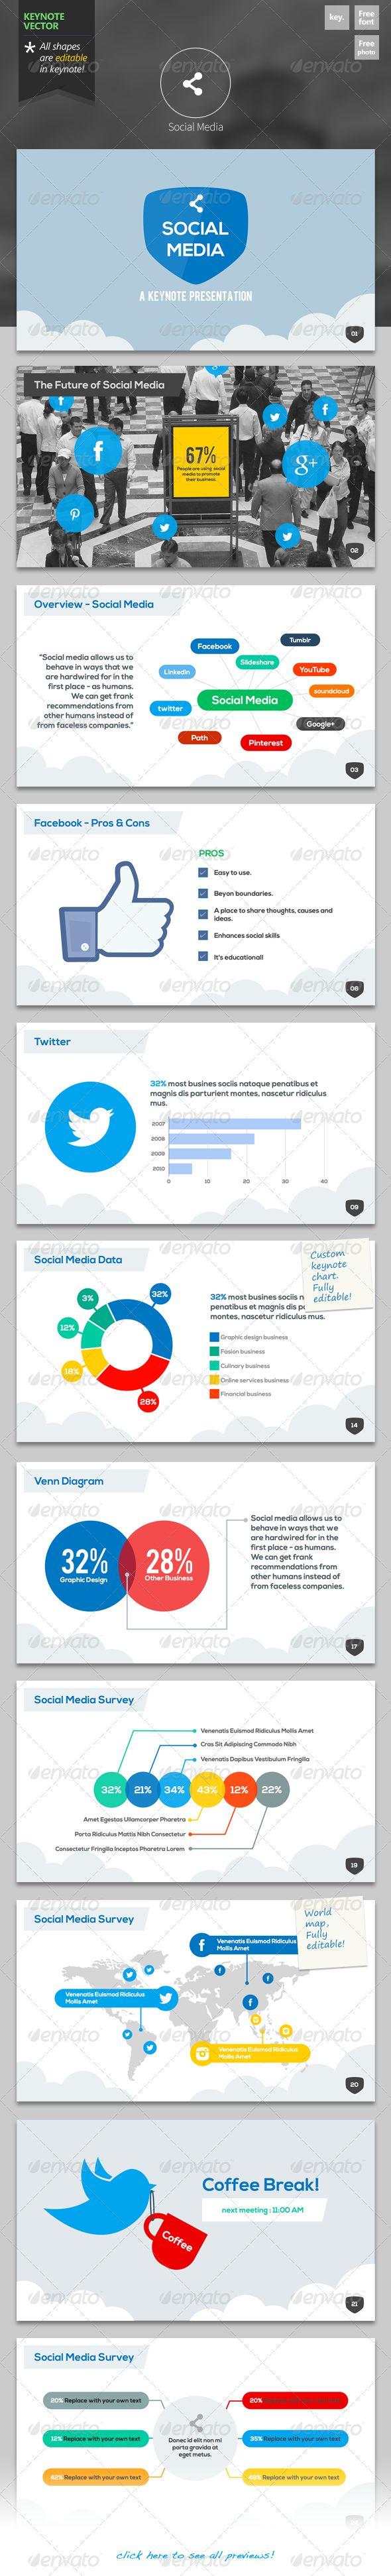 124 best keynote themes templates images on pinterest social media keynote template toneelgroepblik Choice Image